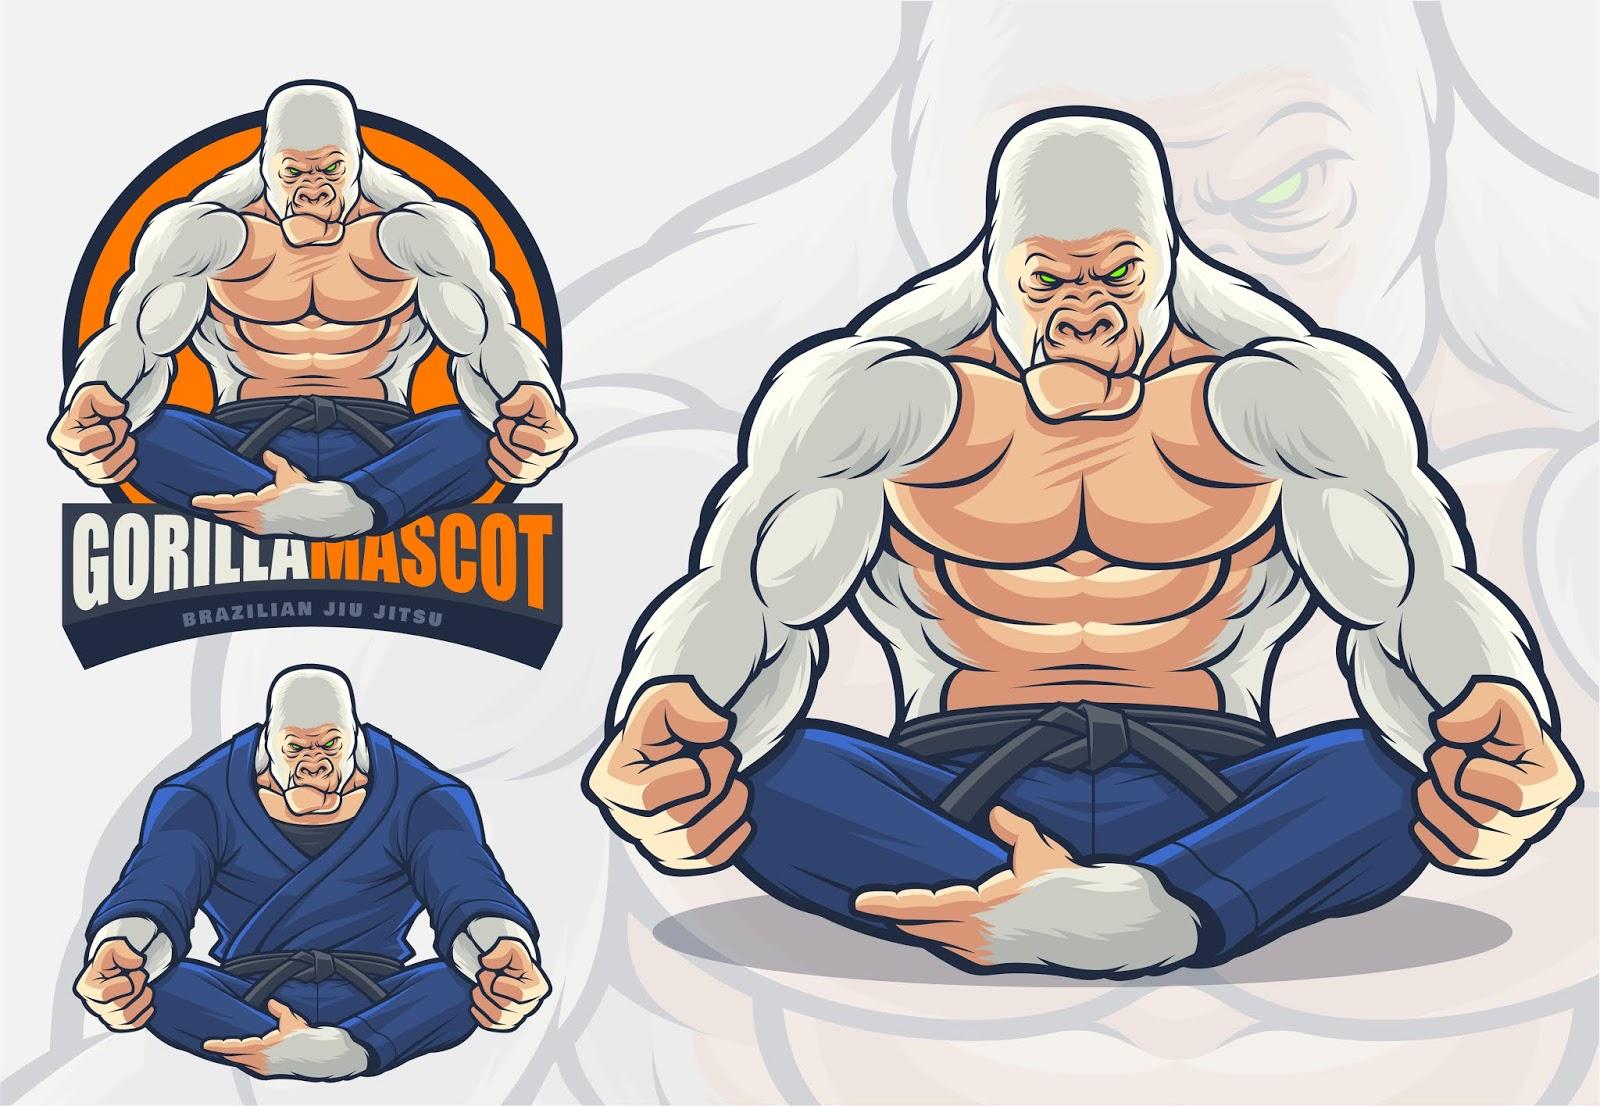 Gorilla Mascot Brazilian Jiu Jitsu Martial Arts Free Download Vector CDR, AI, EPS and PNG Formats